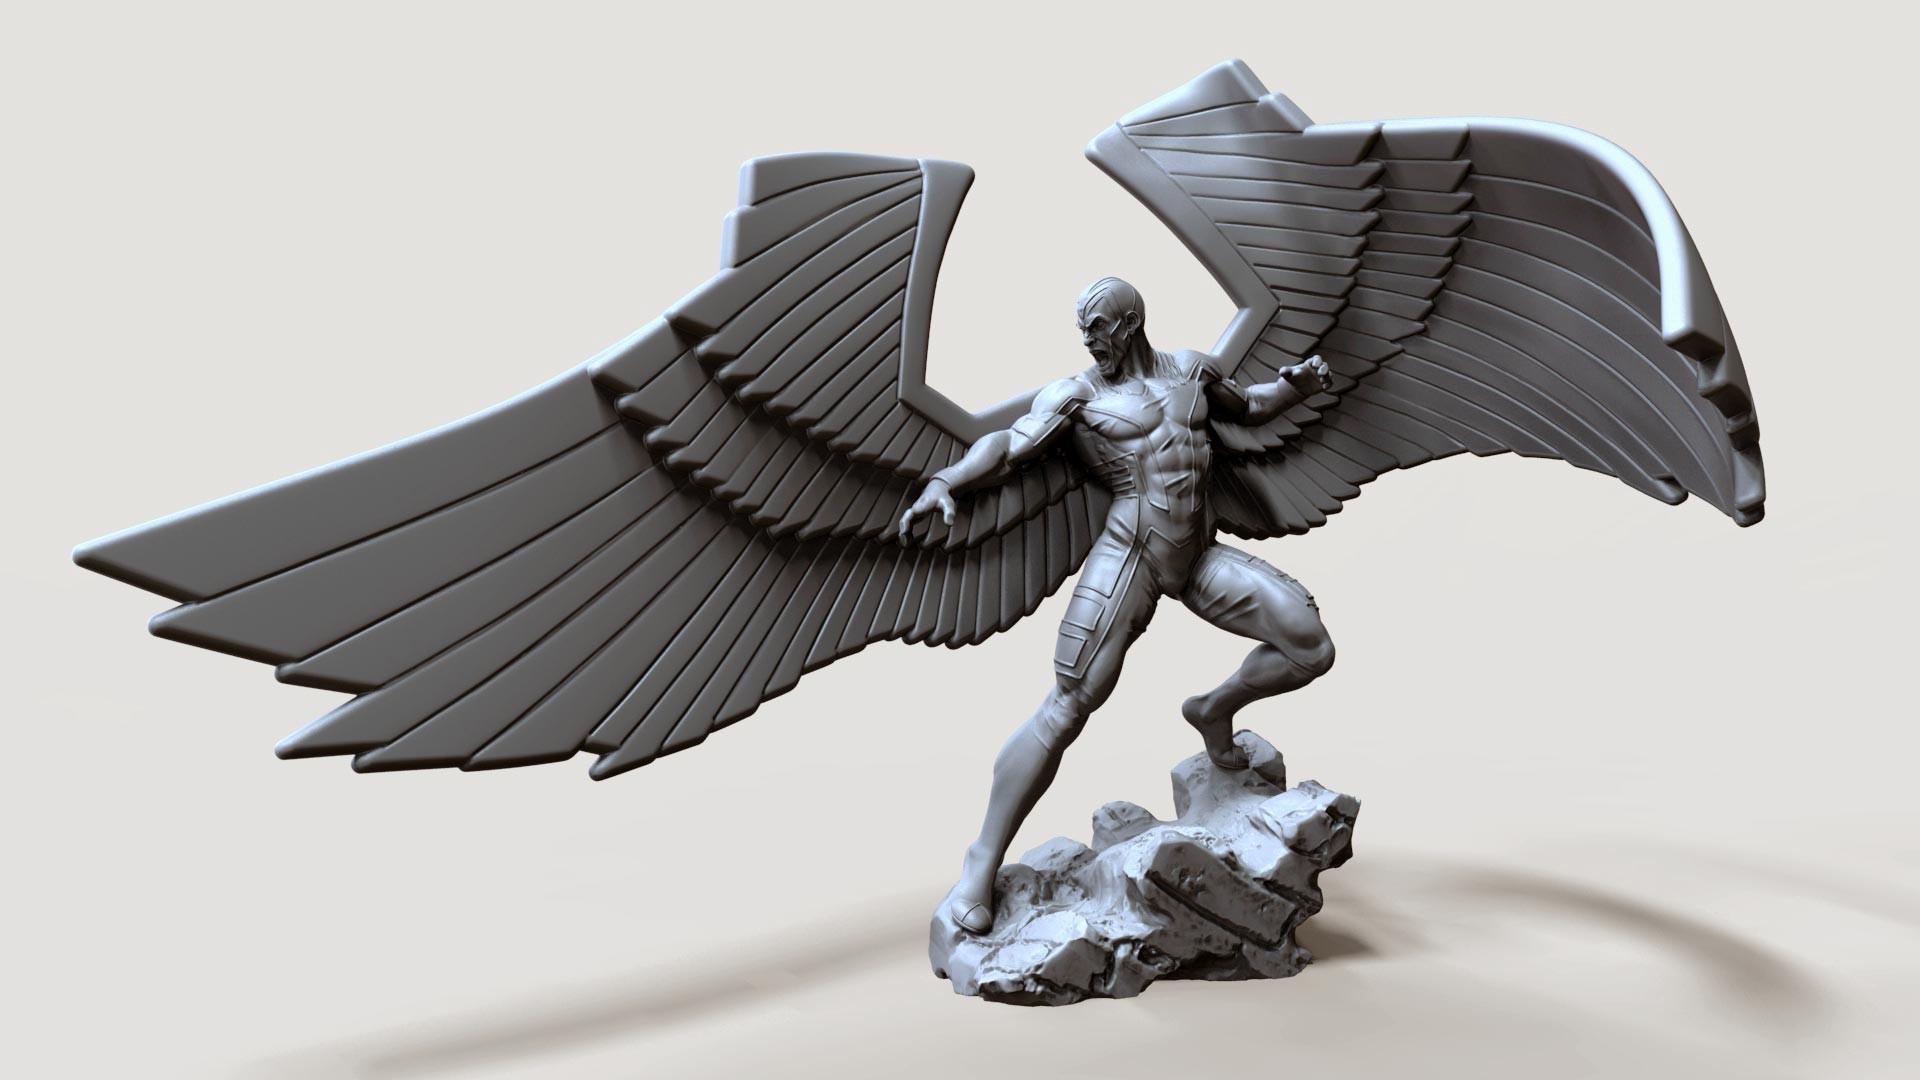 Andre de souza archangel 2